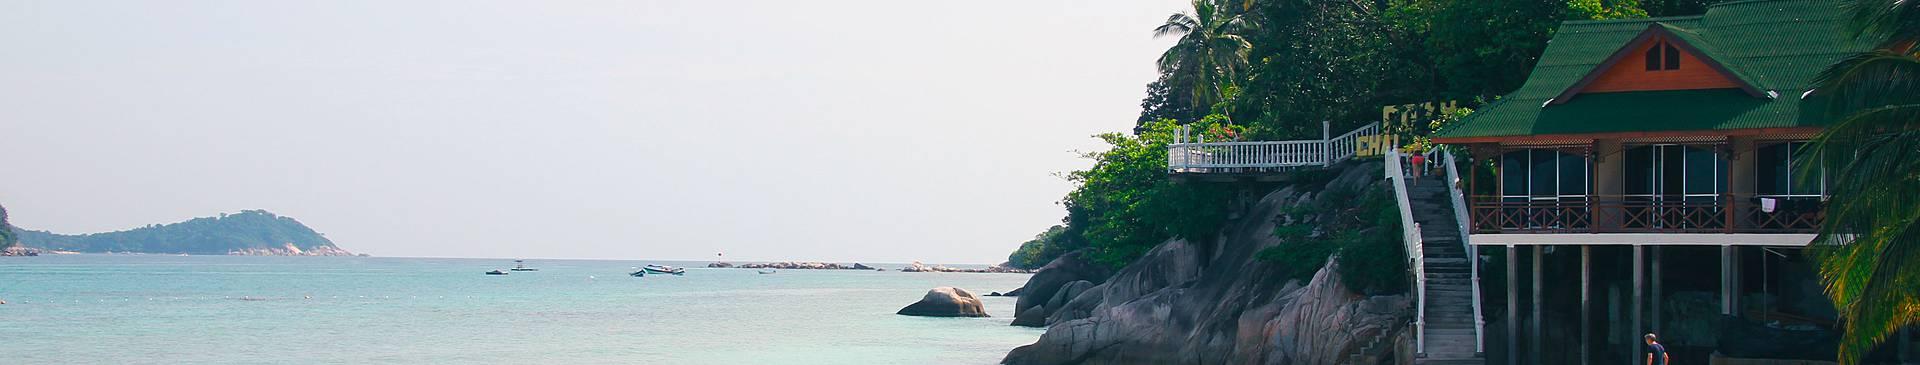 Voyage plage en Malaisie